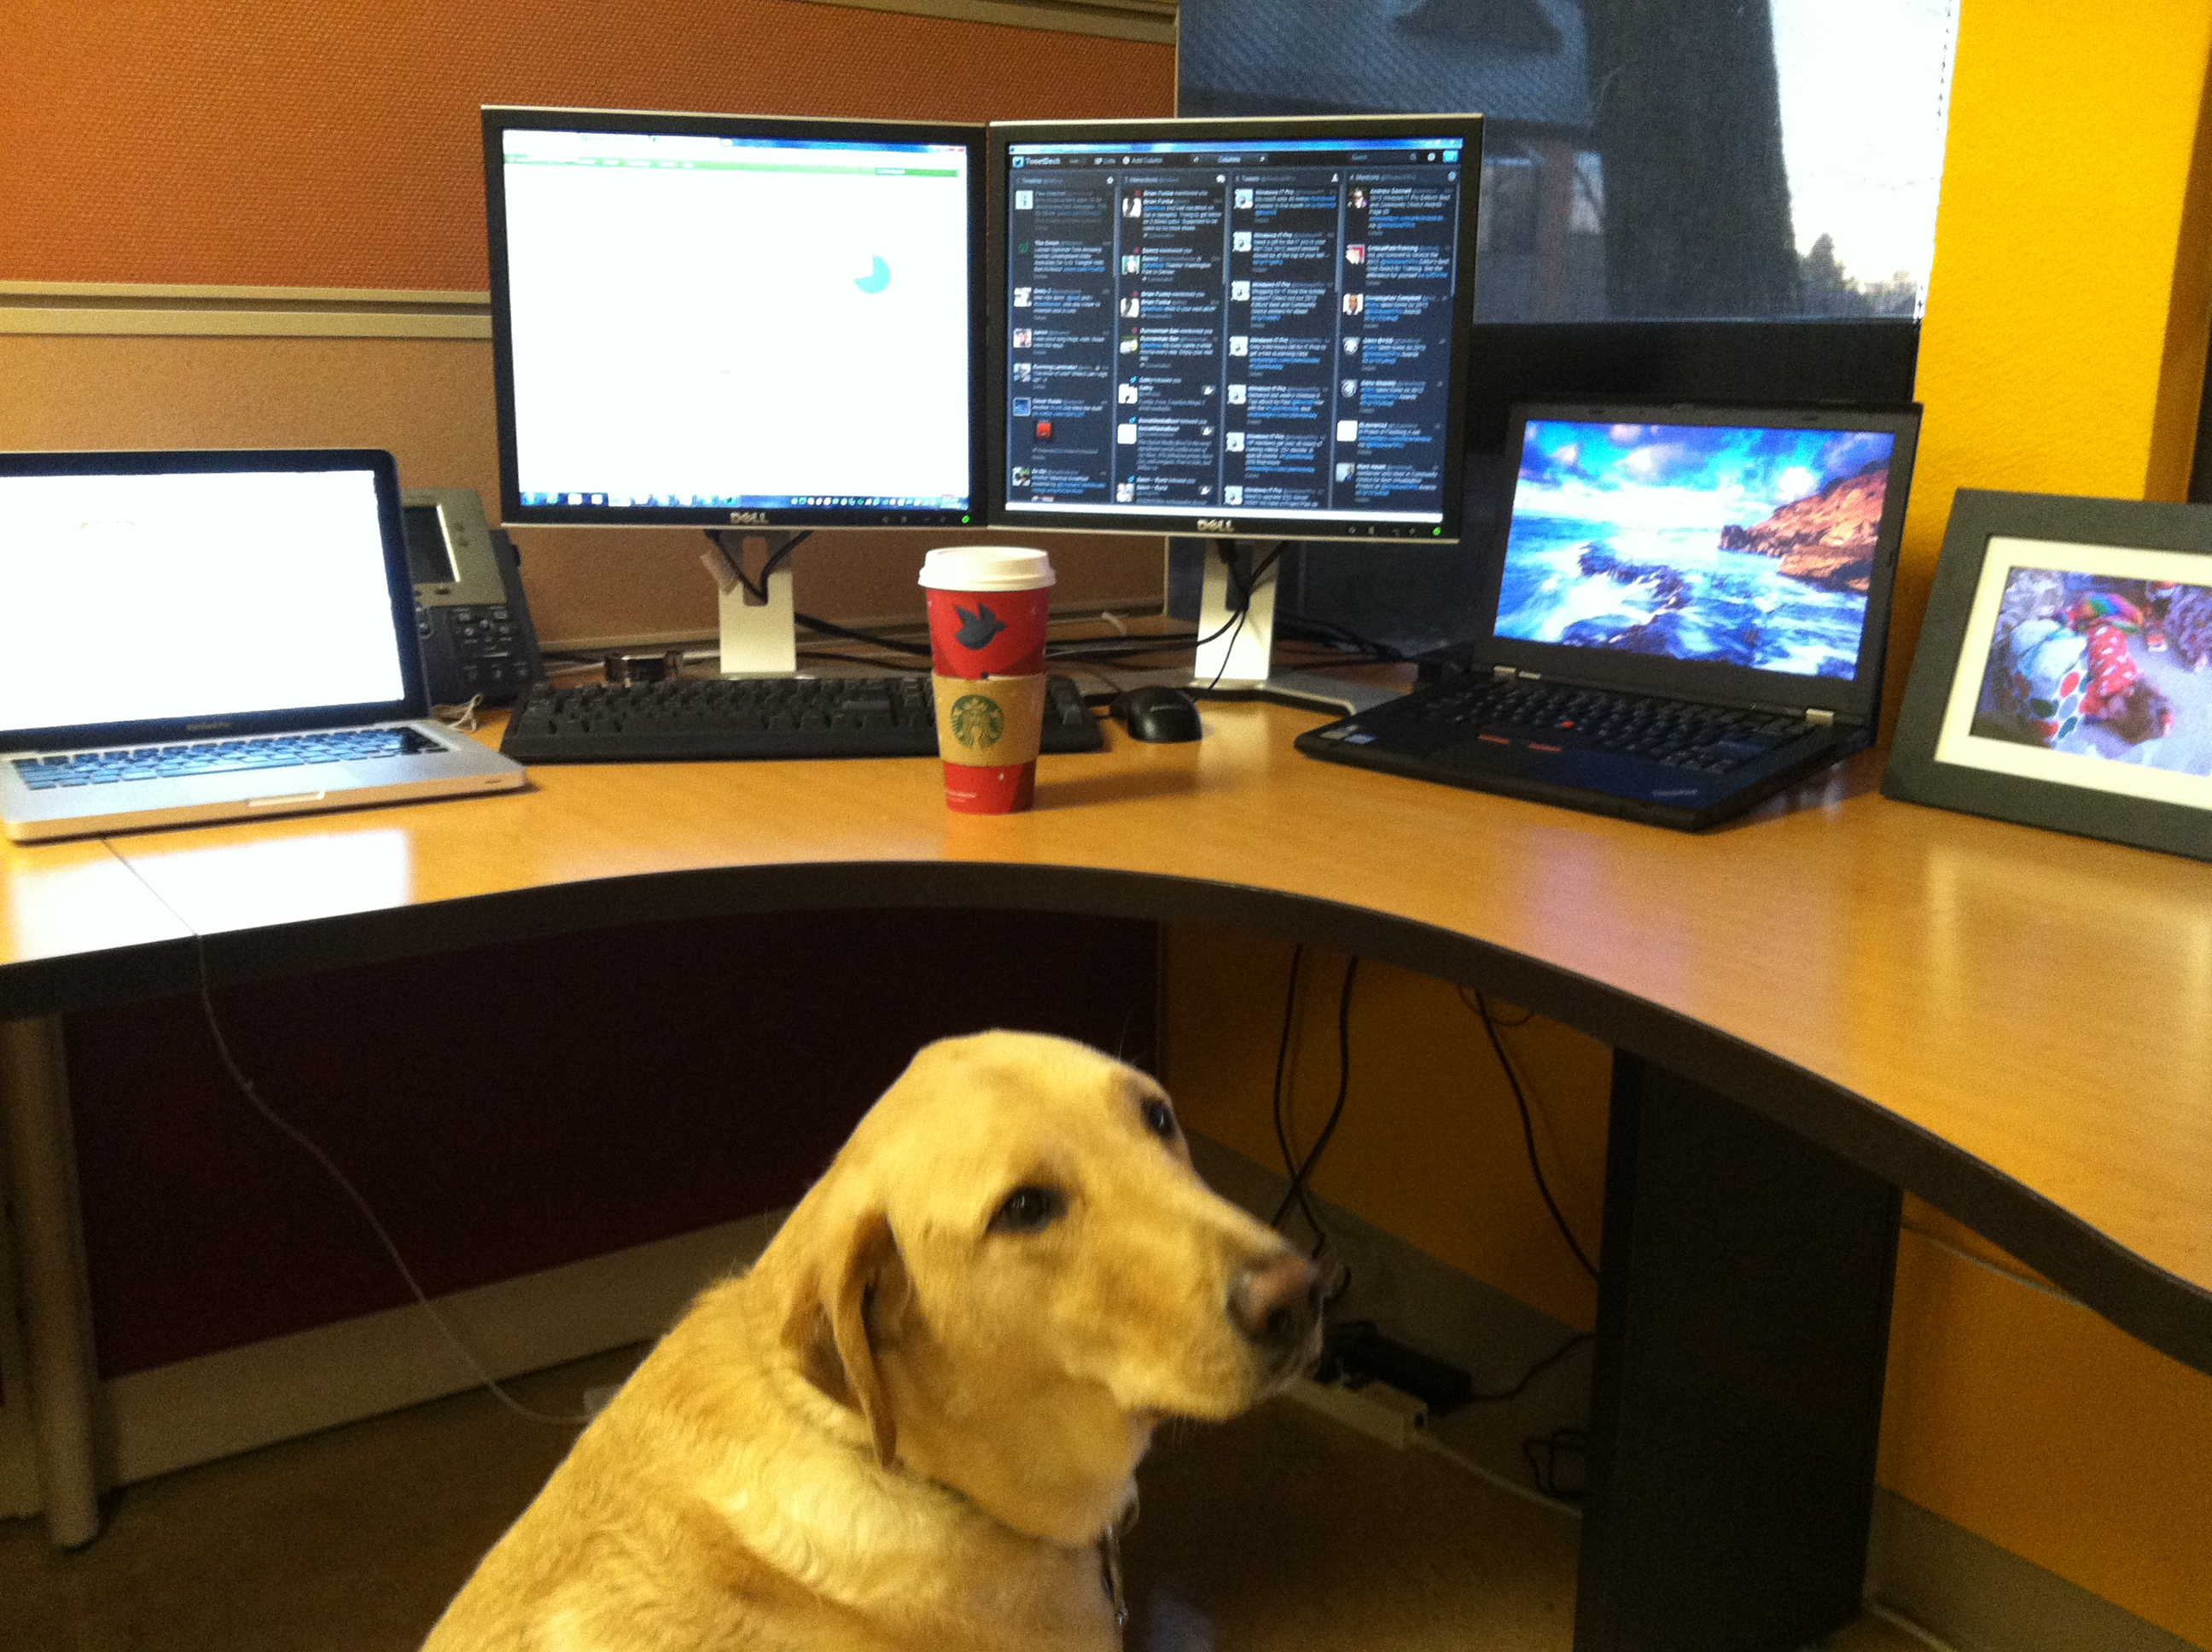 Dog Guard for Coffee